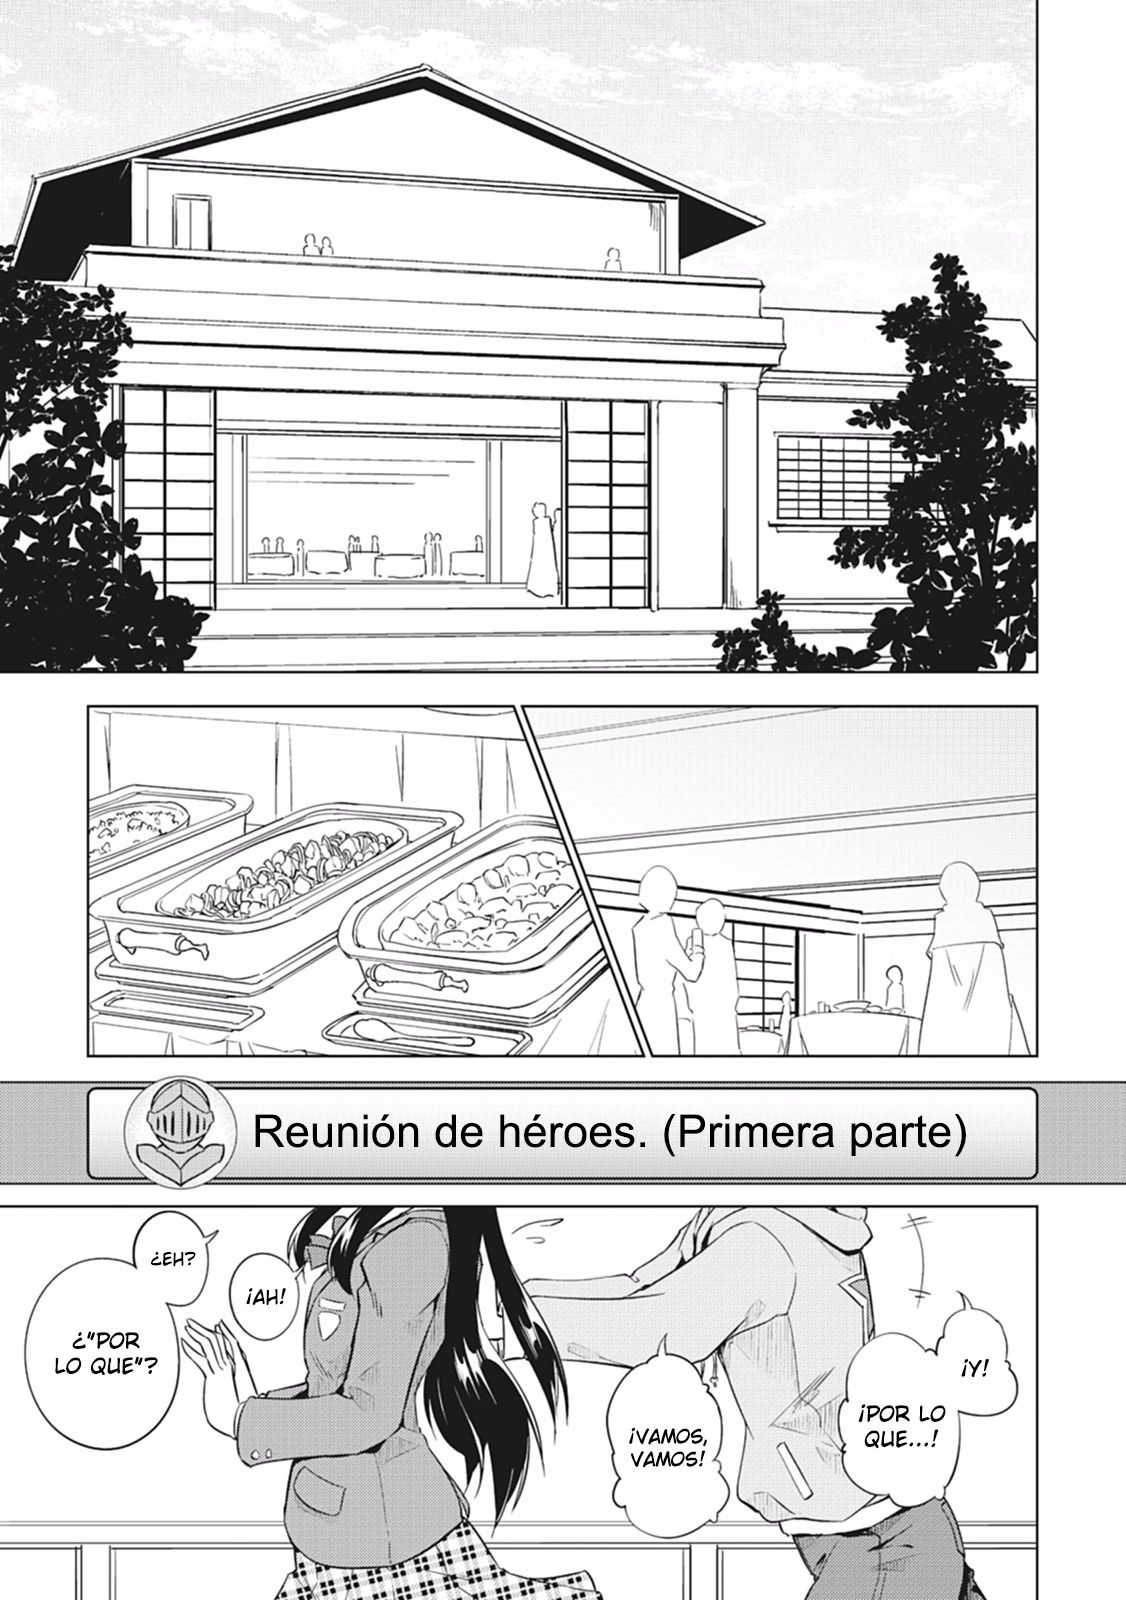 https://c9.mangatag.com/es_manga/pic4/12/22924/624047/e7845fc8e843cce720bb30f34339ed30.jpg Page 1